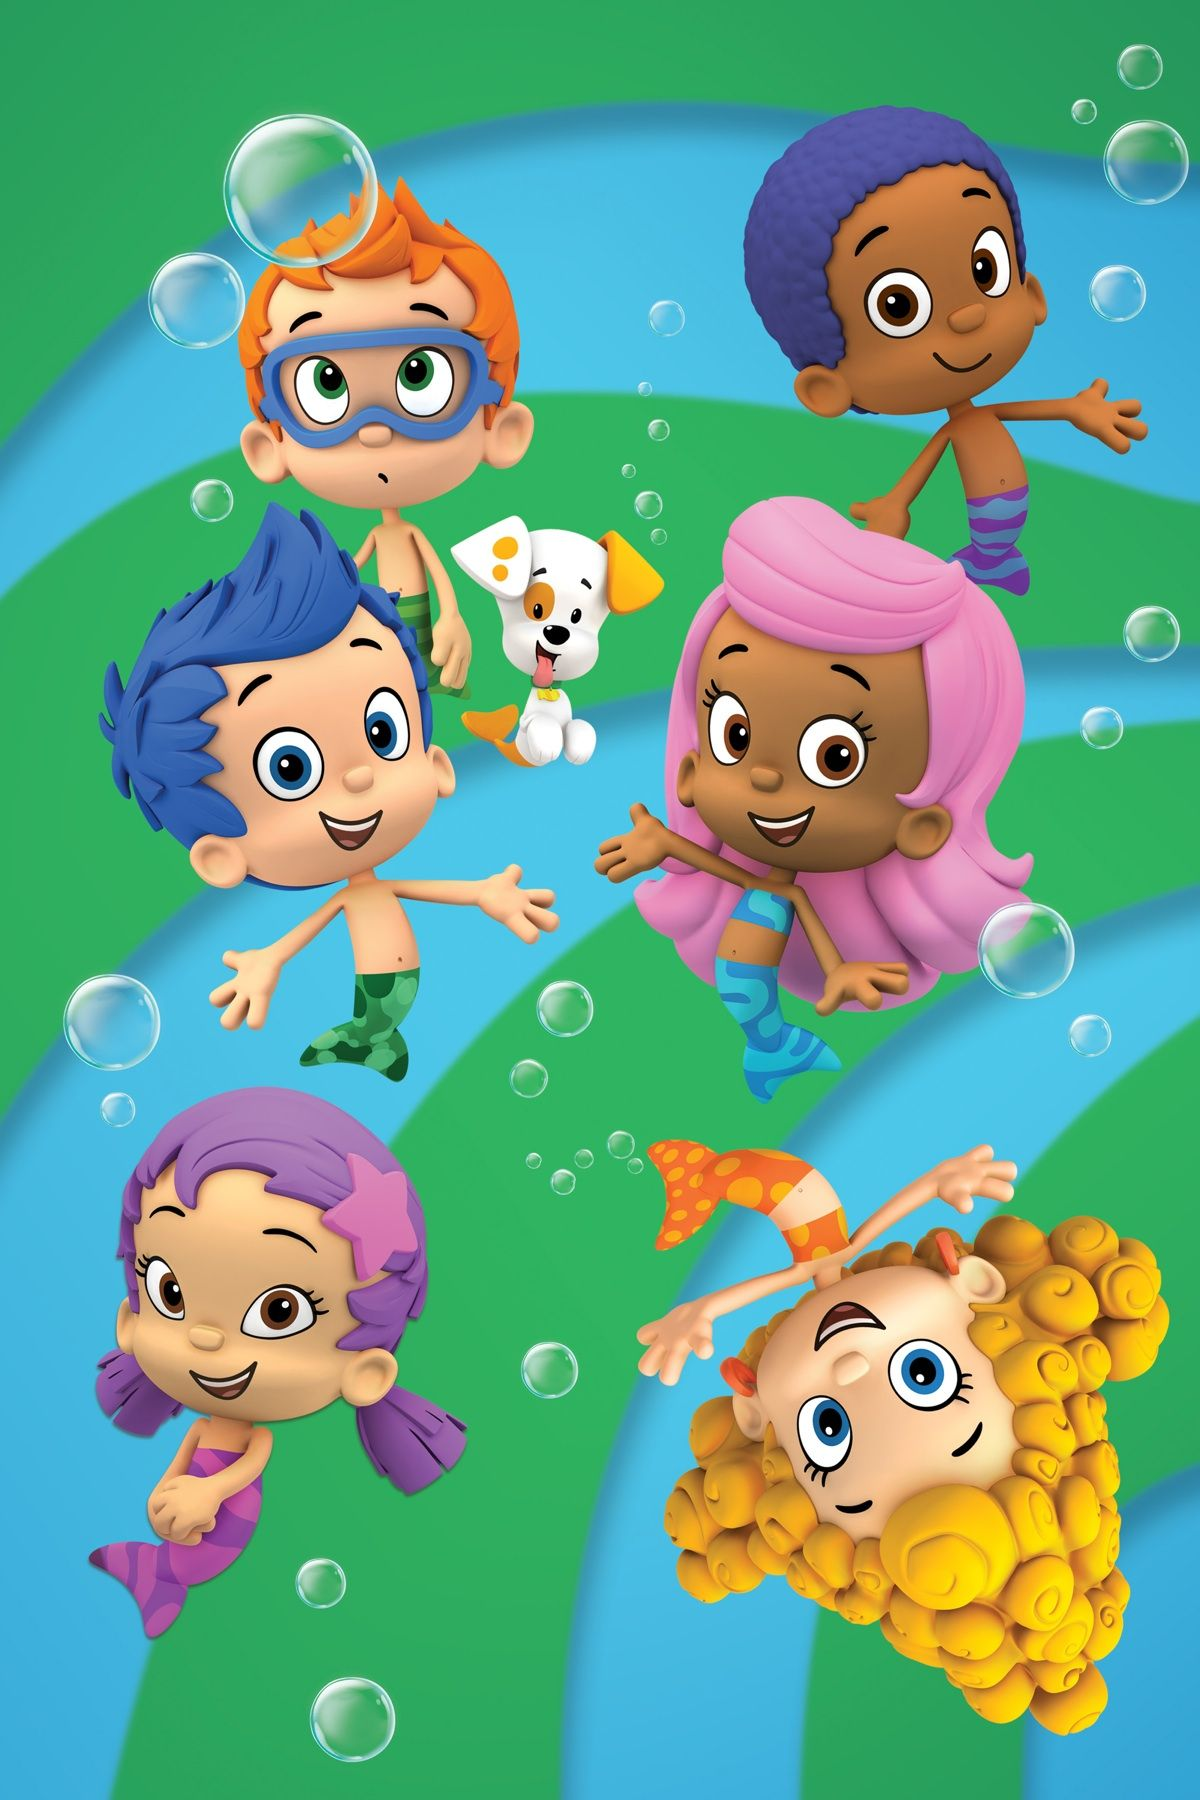 bubble guppies serie animada creada por jonny belt y robert scull